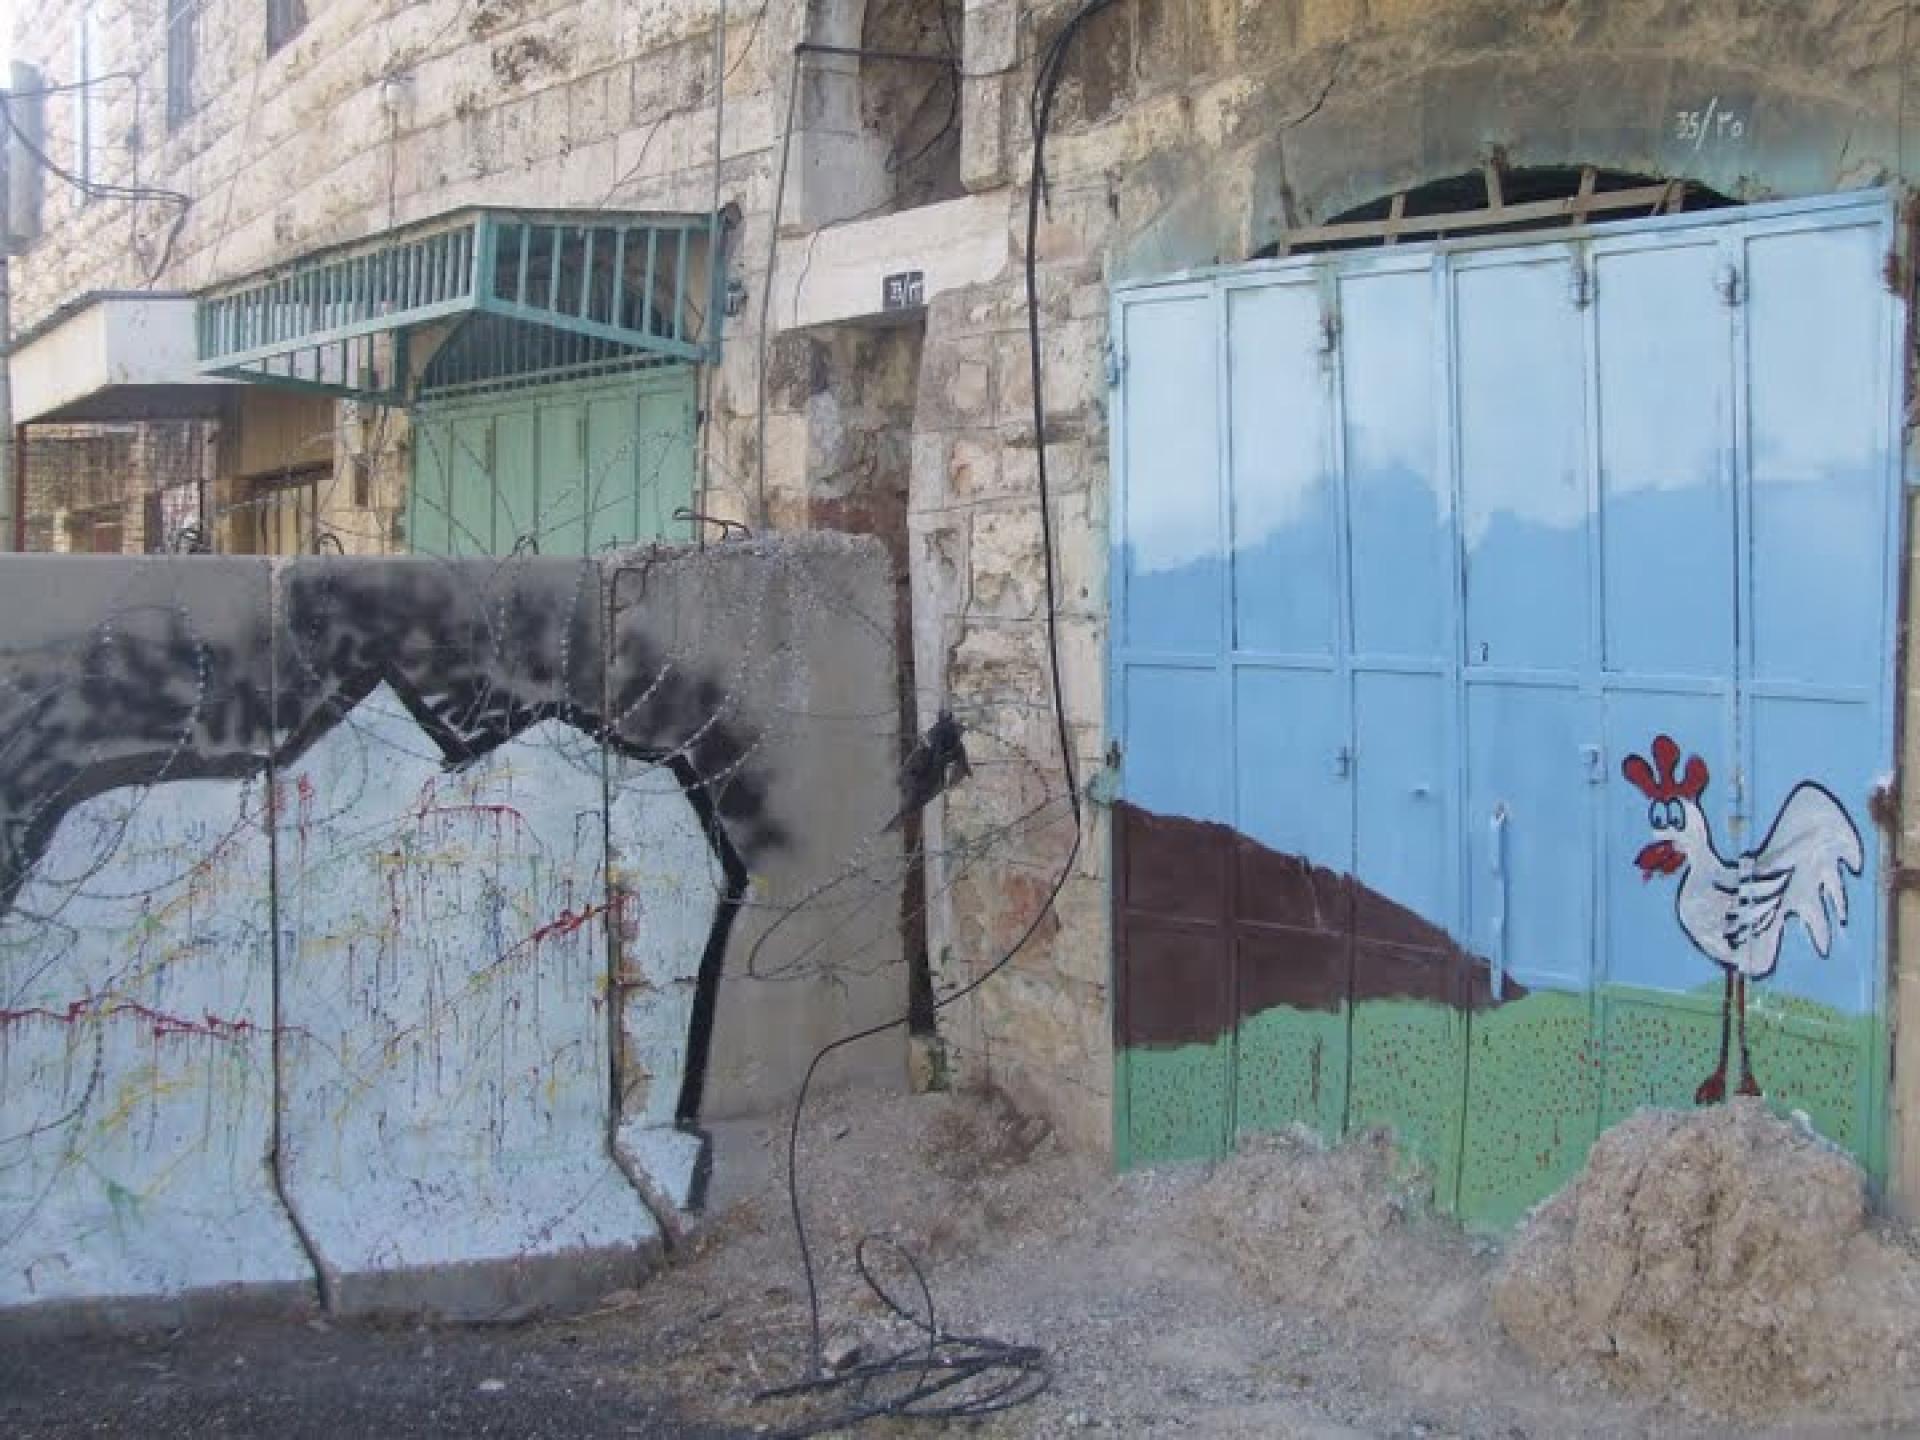 Hebron 06.08.09